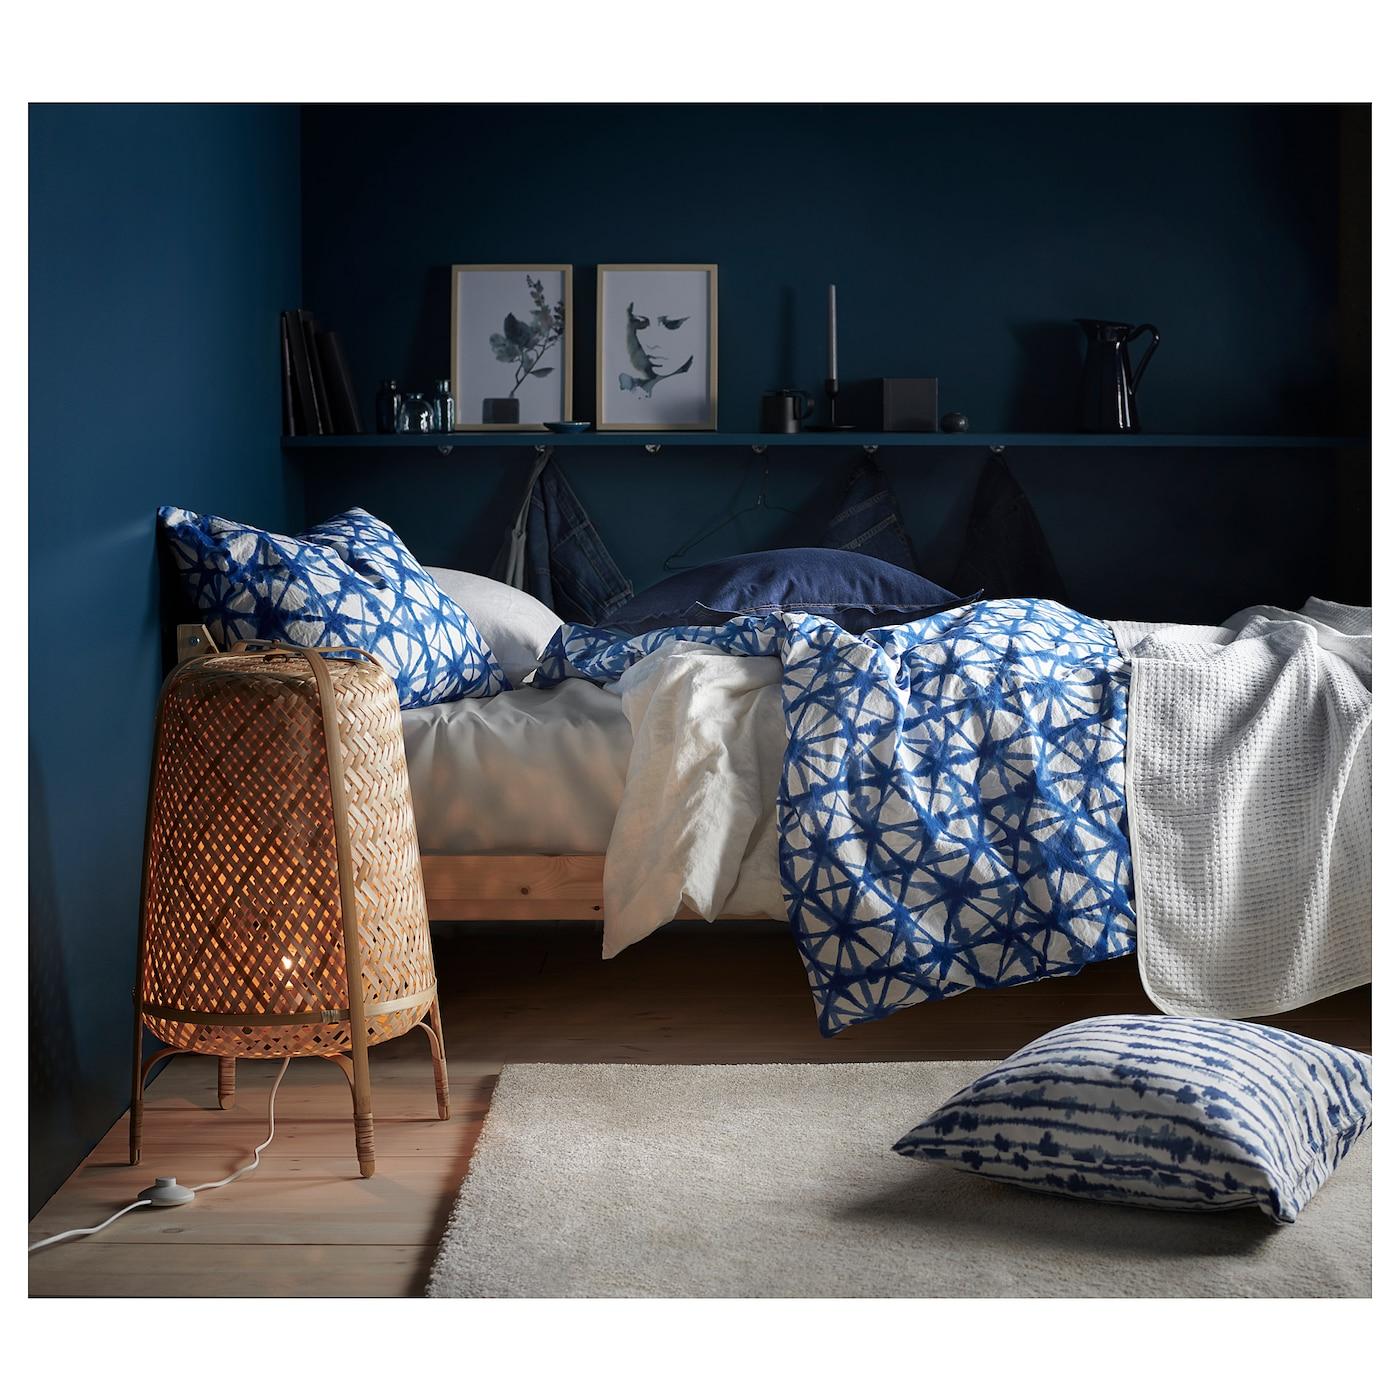 Ikea Off White Area Rug: STOENSE Rug, Low Pile Off-white 133 X 195 Cm